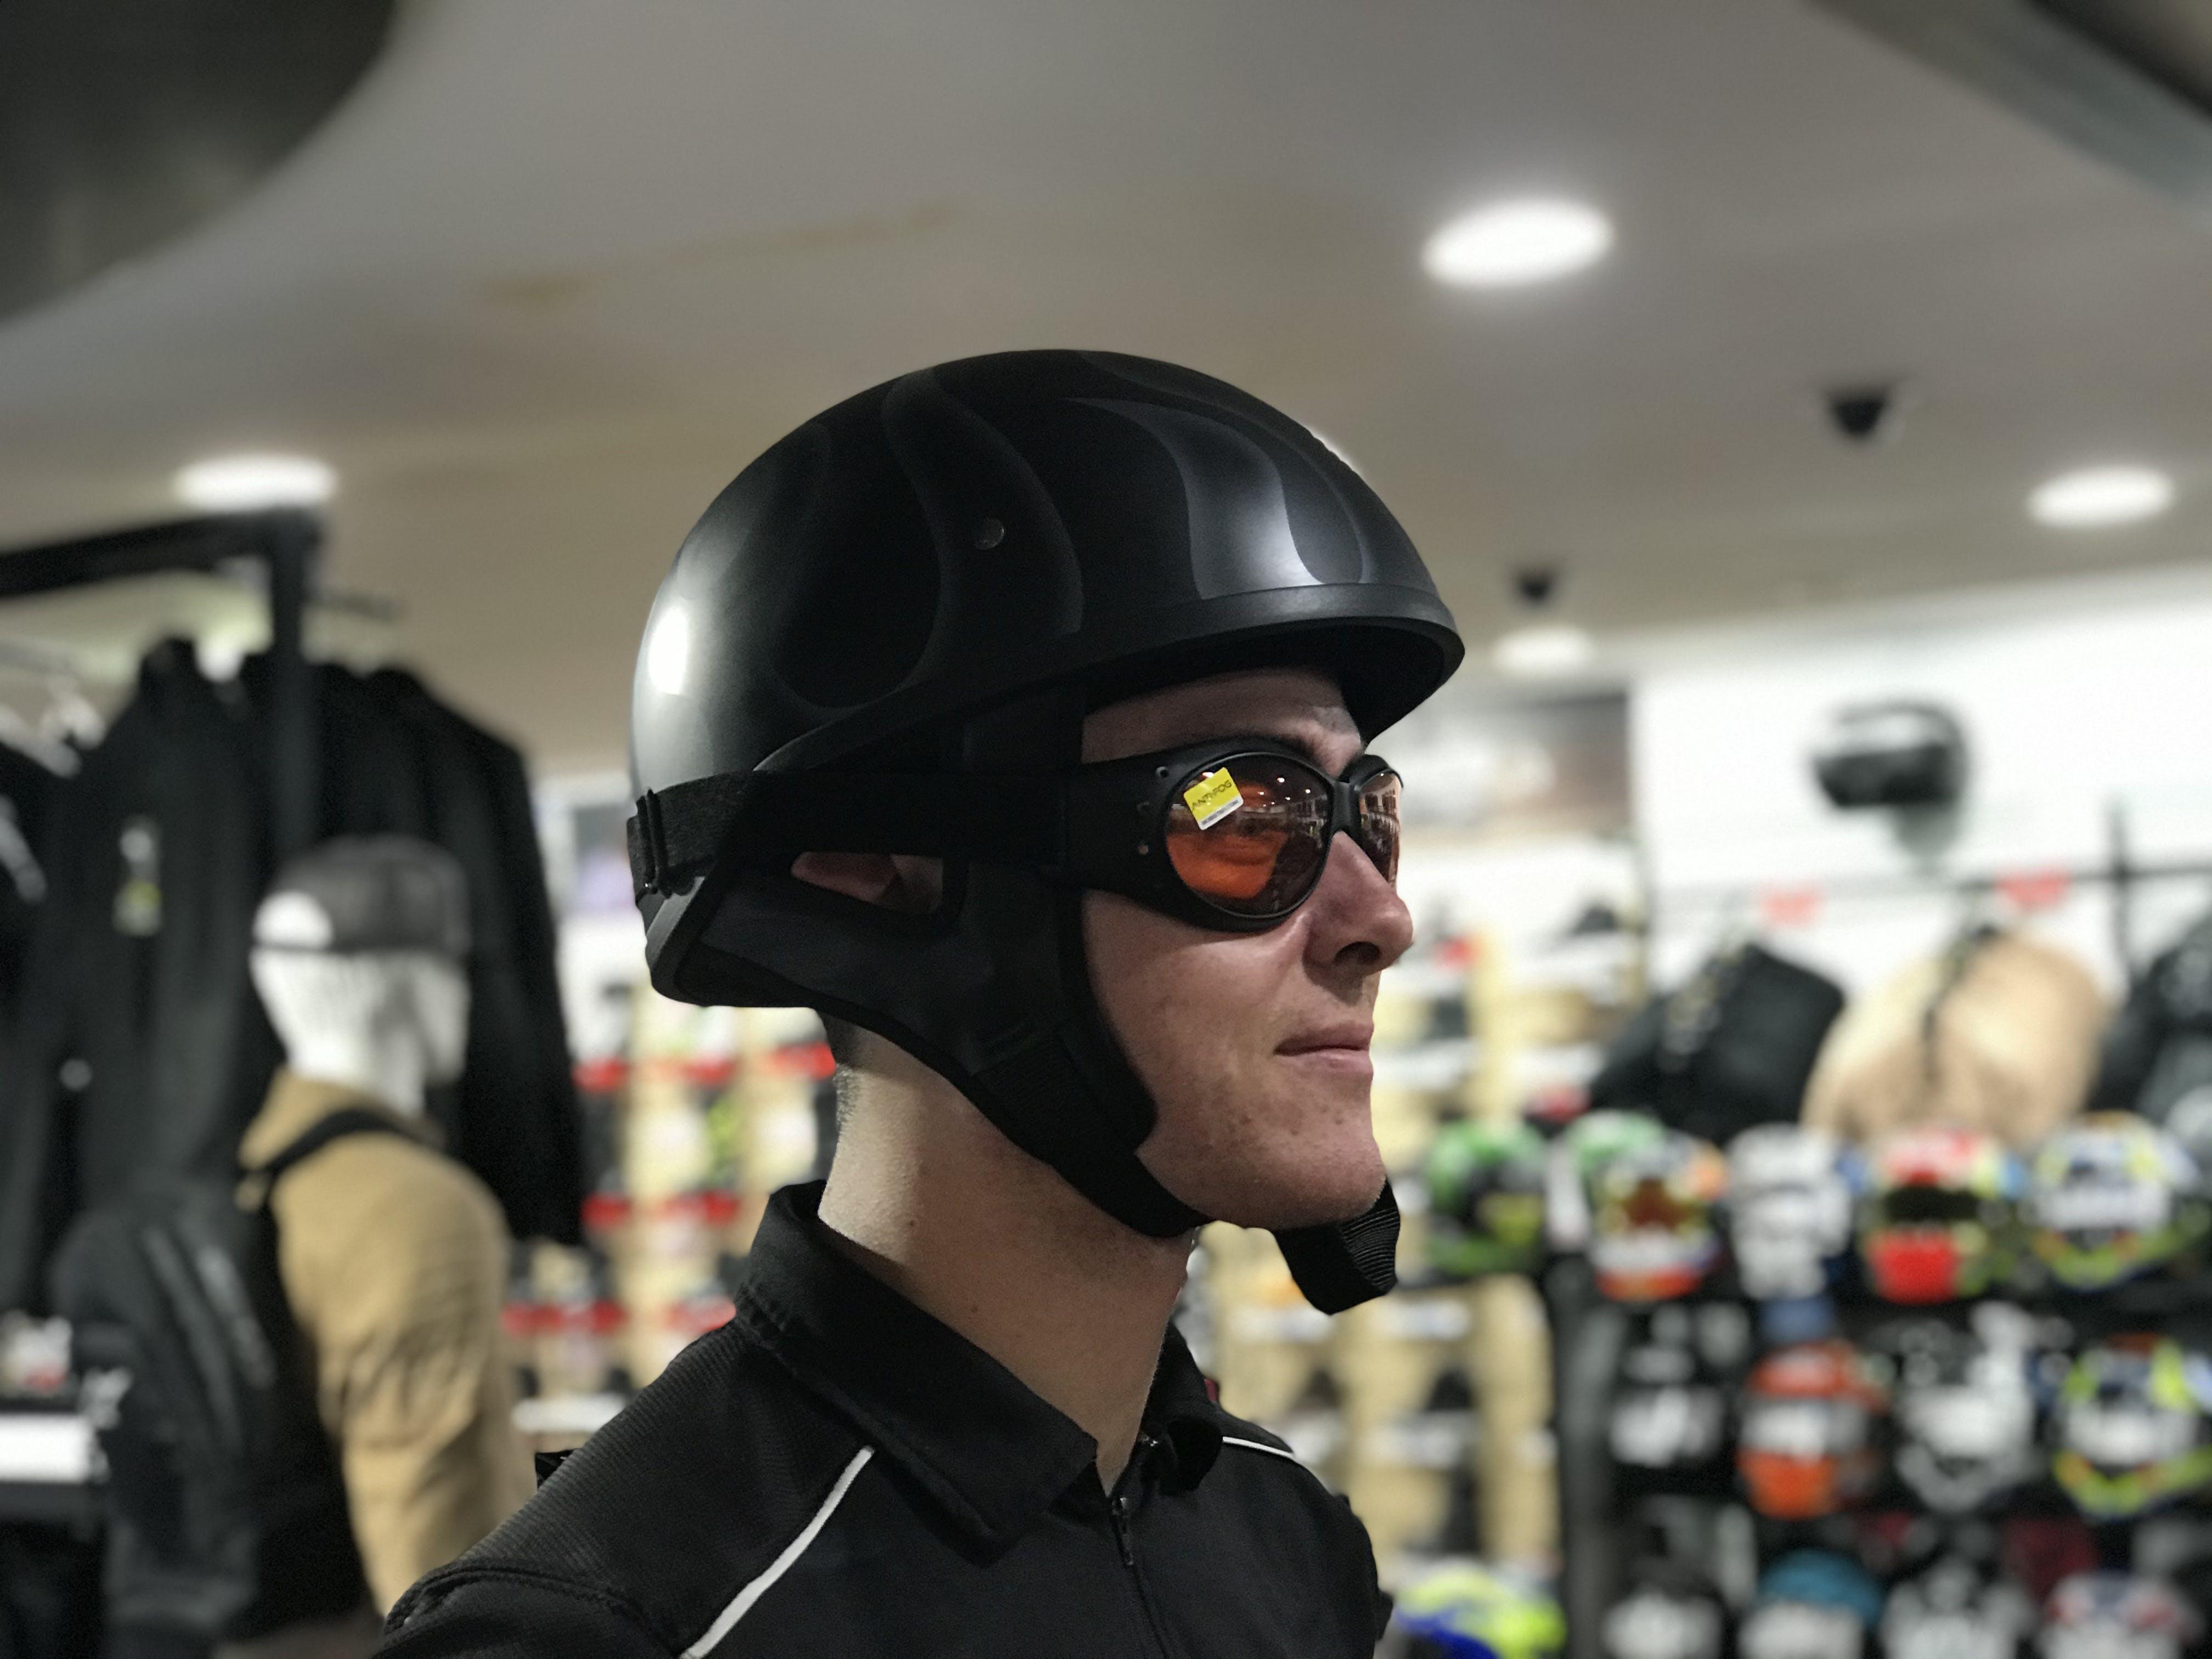 Half face helmet with orange goggles on a man